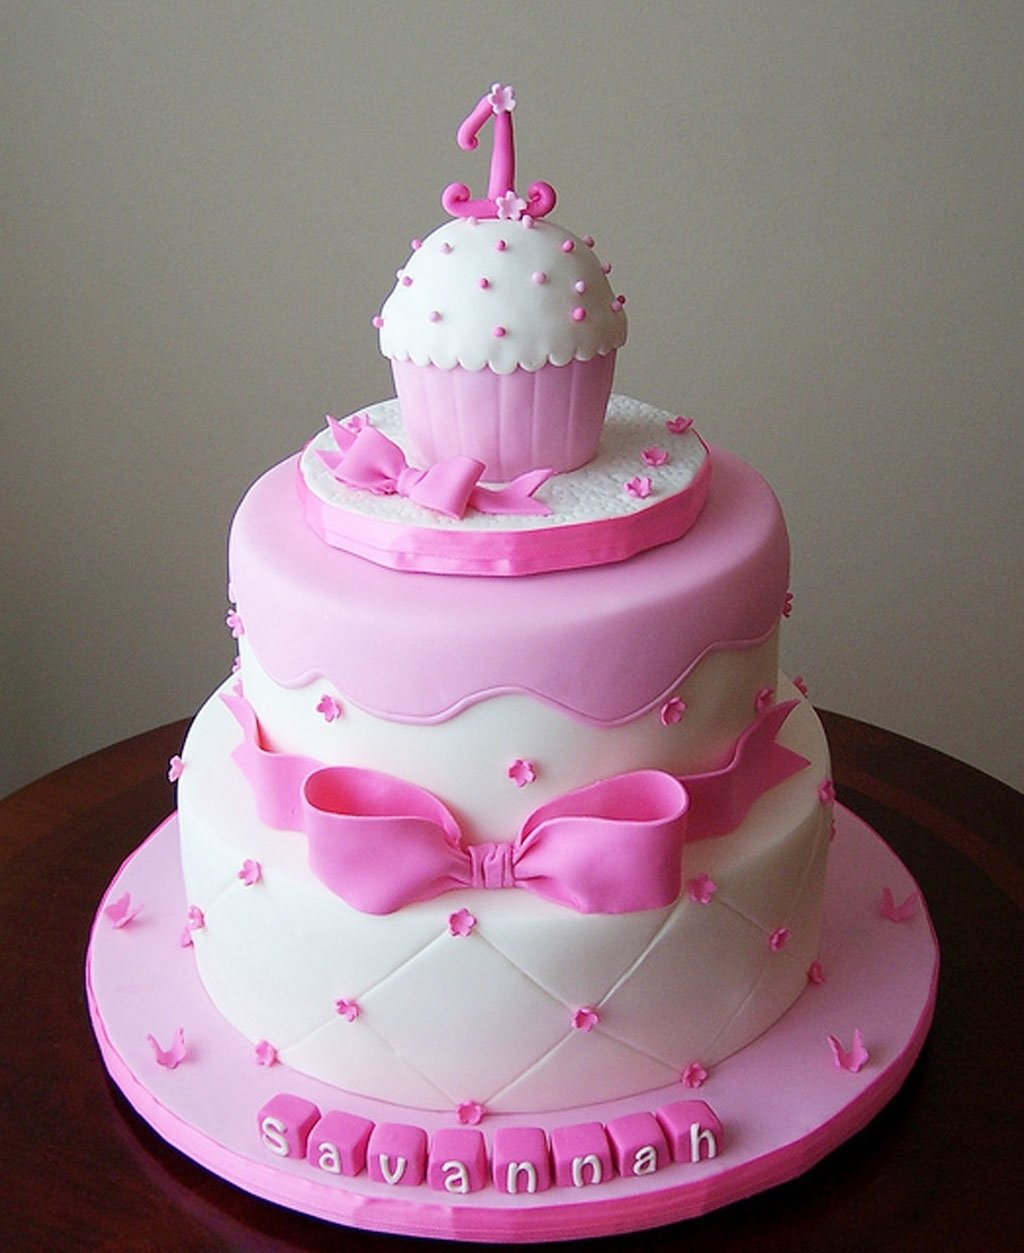 10 Pretty Birthday Cake Ideas For Girls